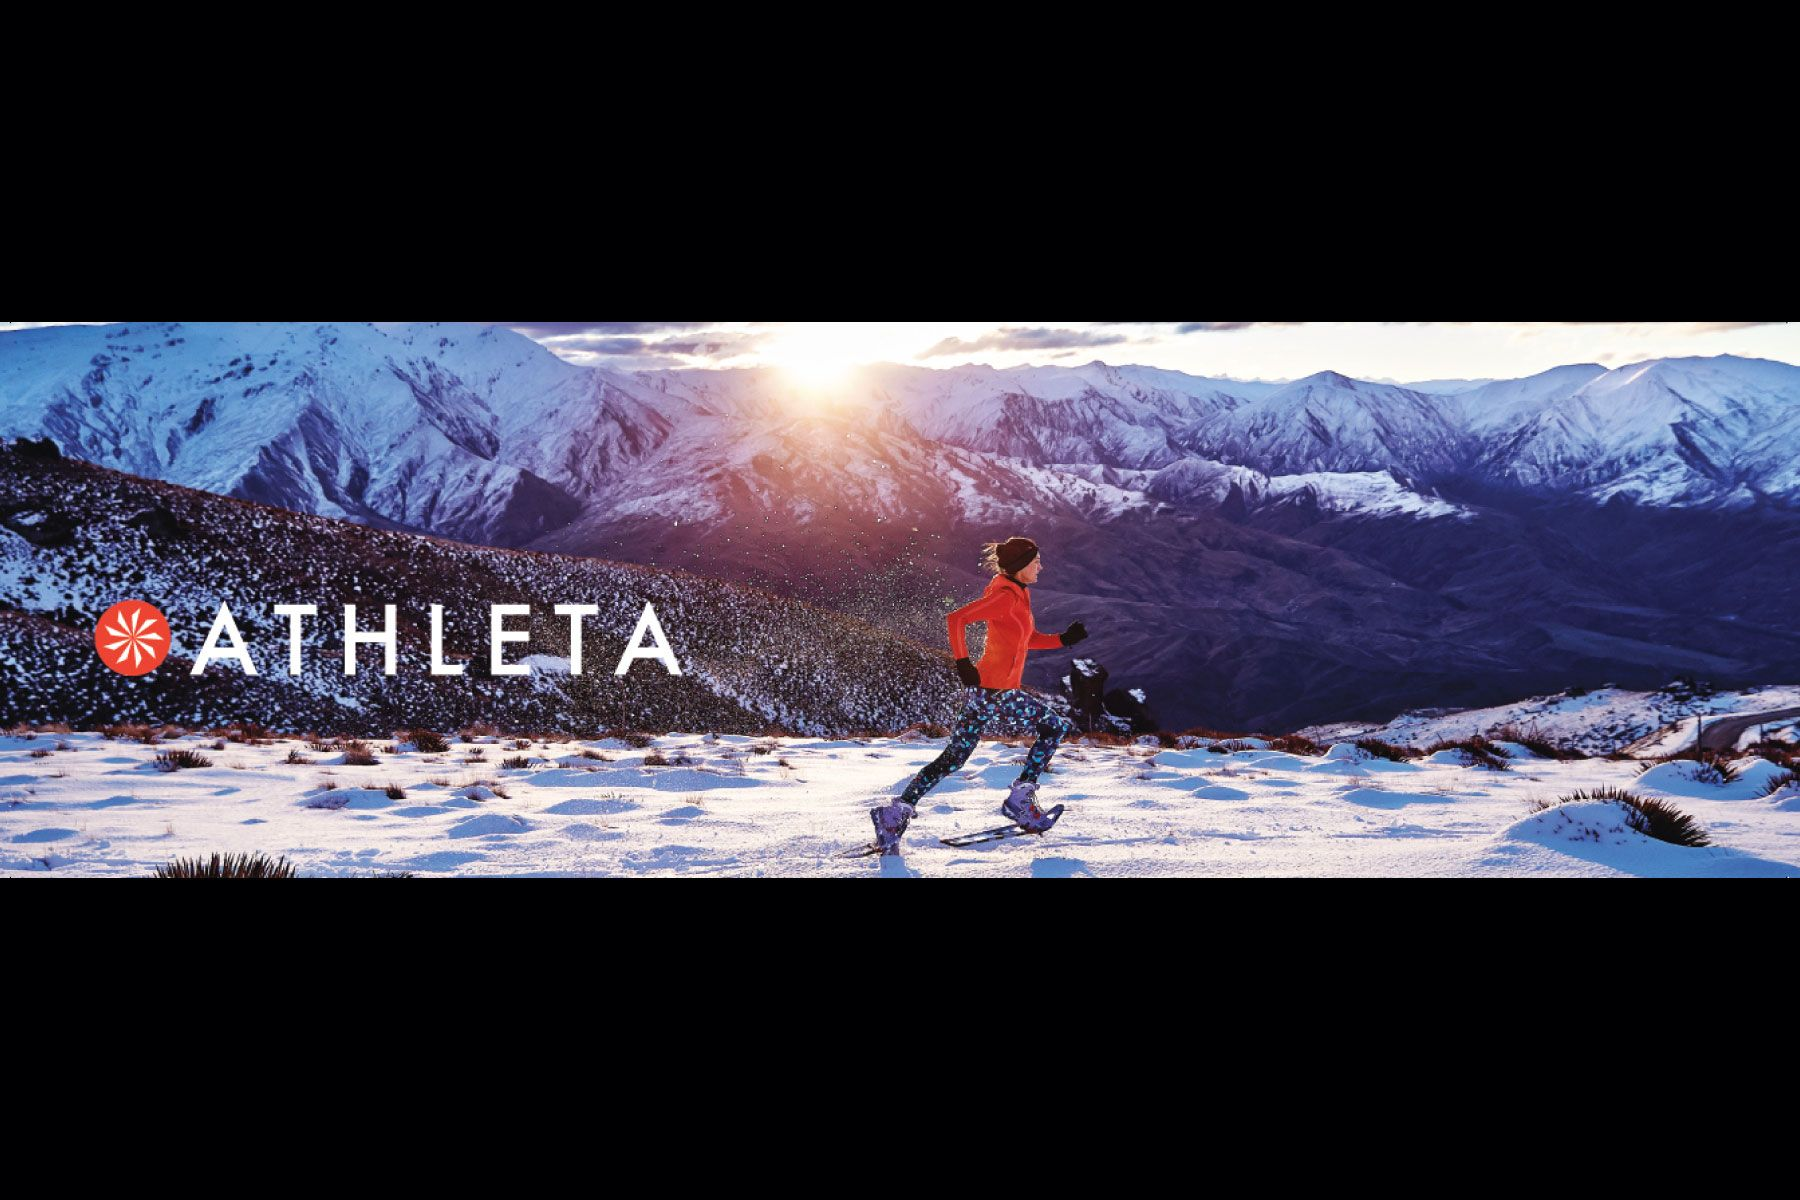 Athleta-Opening-Images1.jpg